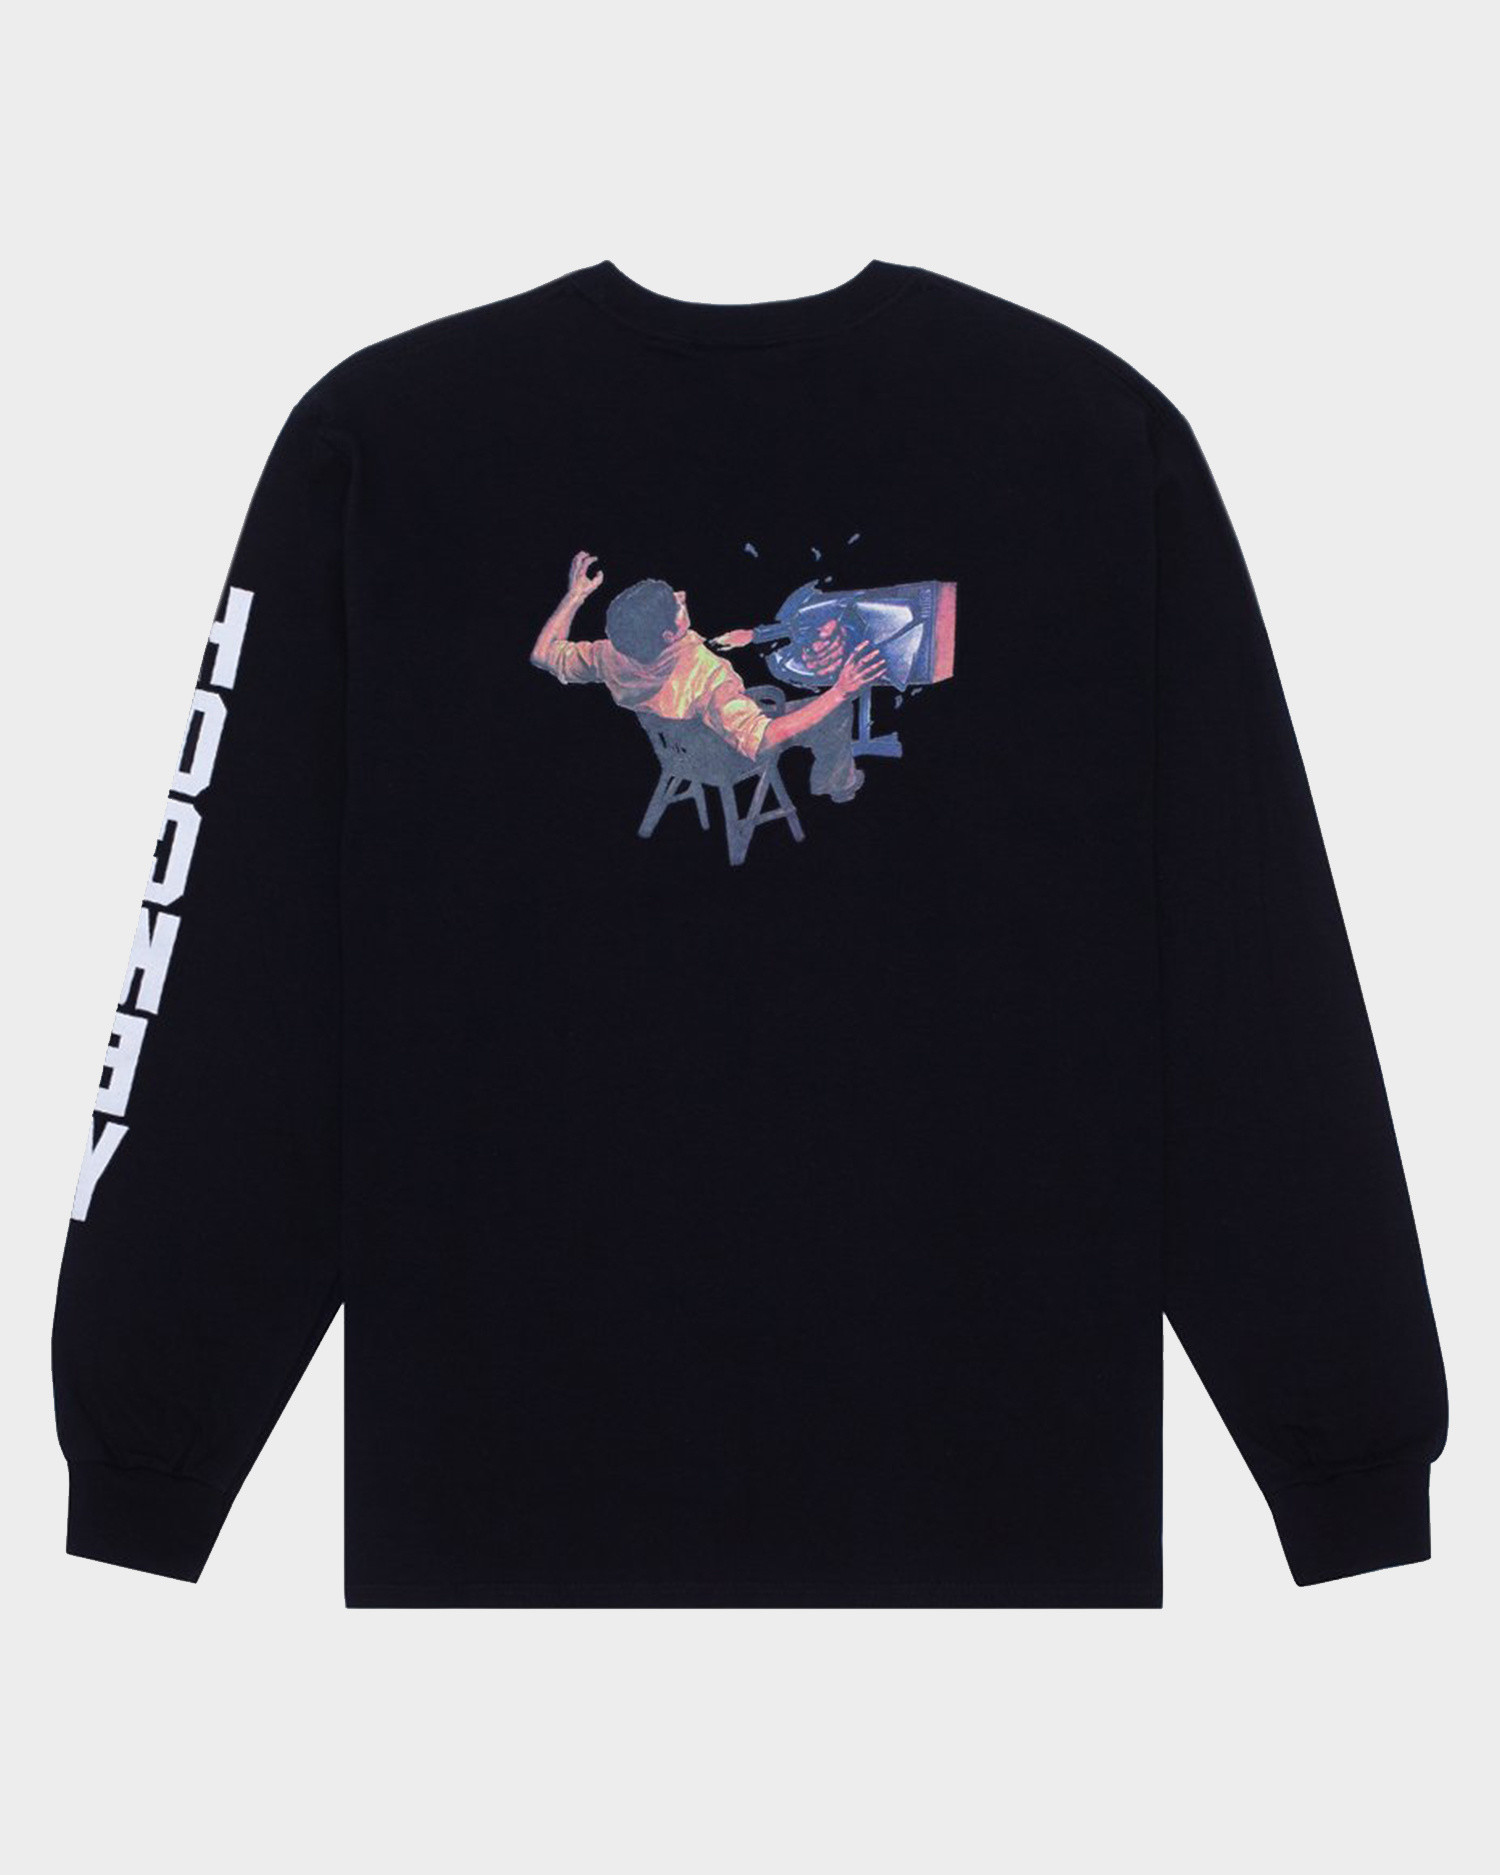 Hockey Ultraviolence Longsleeve T-Shirt Black